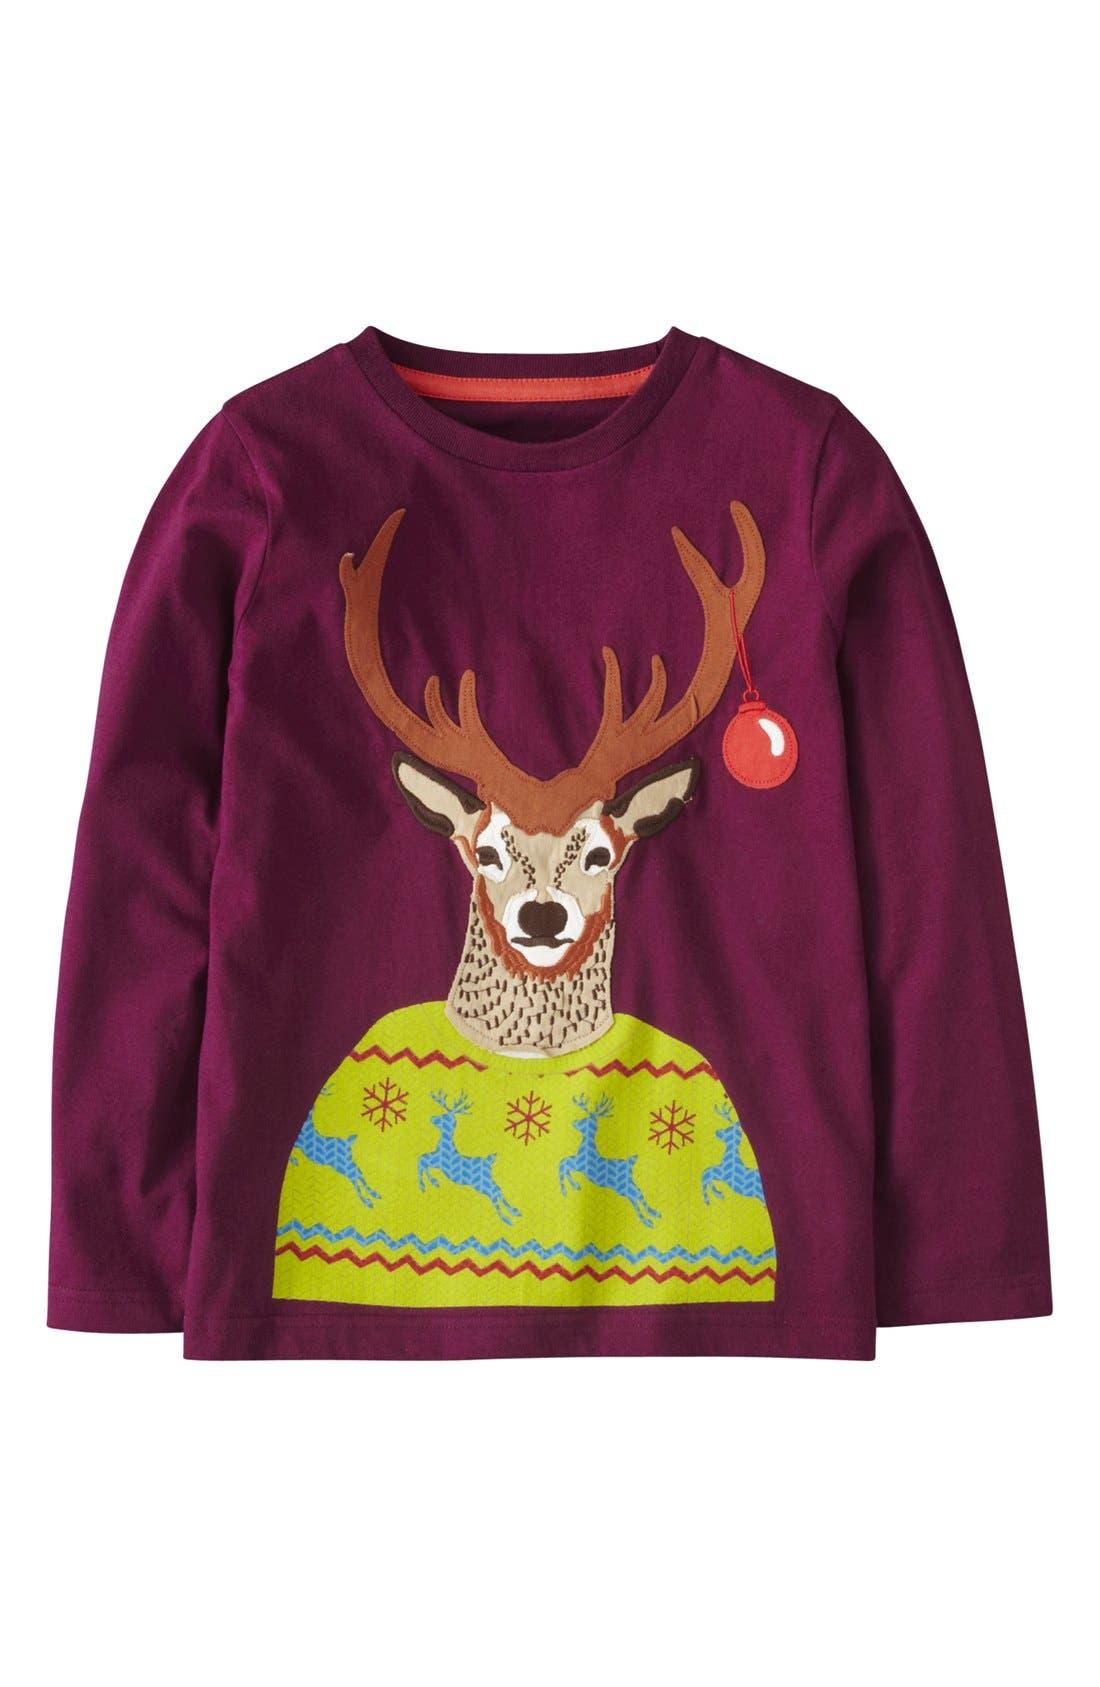 Alternate Image 1 Selected - Mini Boden 'Winter Fun' Long Sleeve T-Shirt (Toddler Boys, Little Boys & Big Boys)